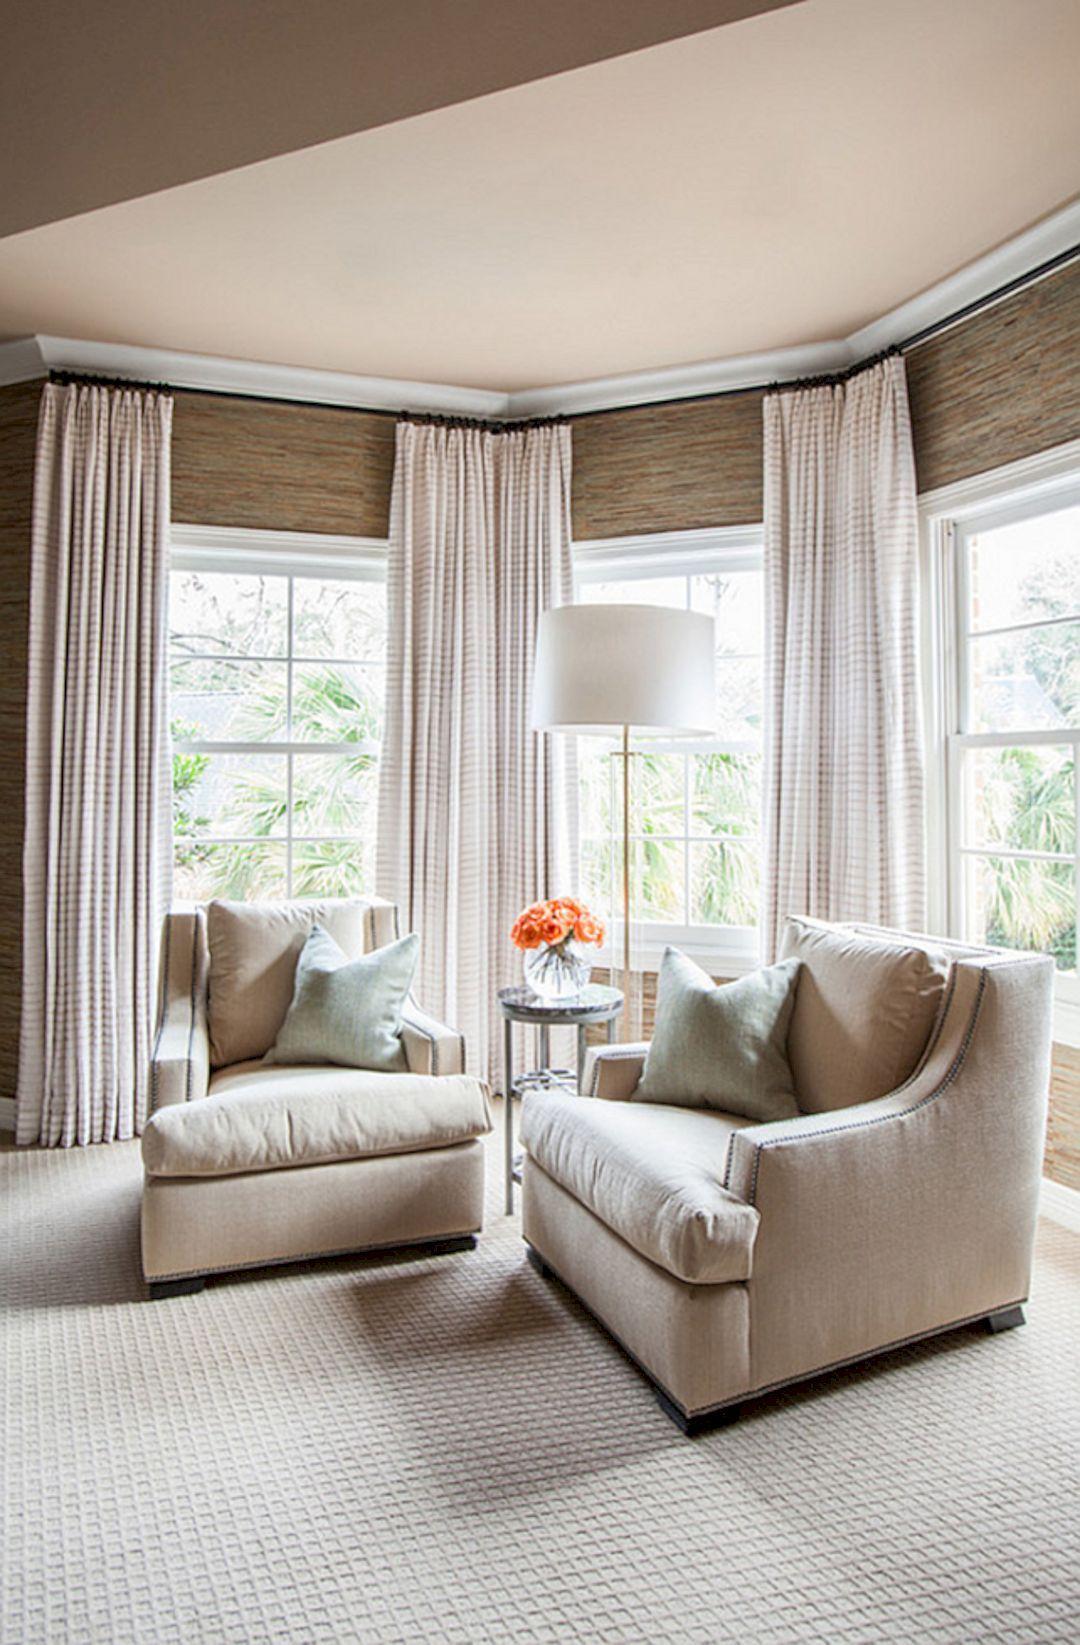 11 Stunning Master Bedroom Decorating Ideas Bedroom Seating Area Bedroom Sitting Room Bedroom With Sitting Area